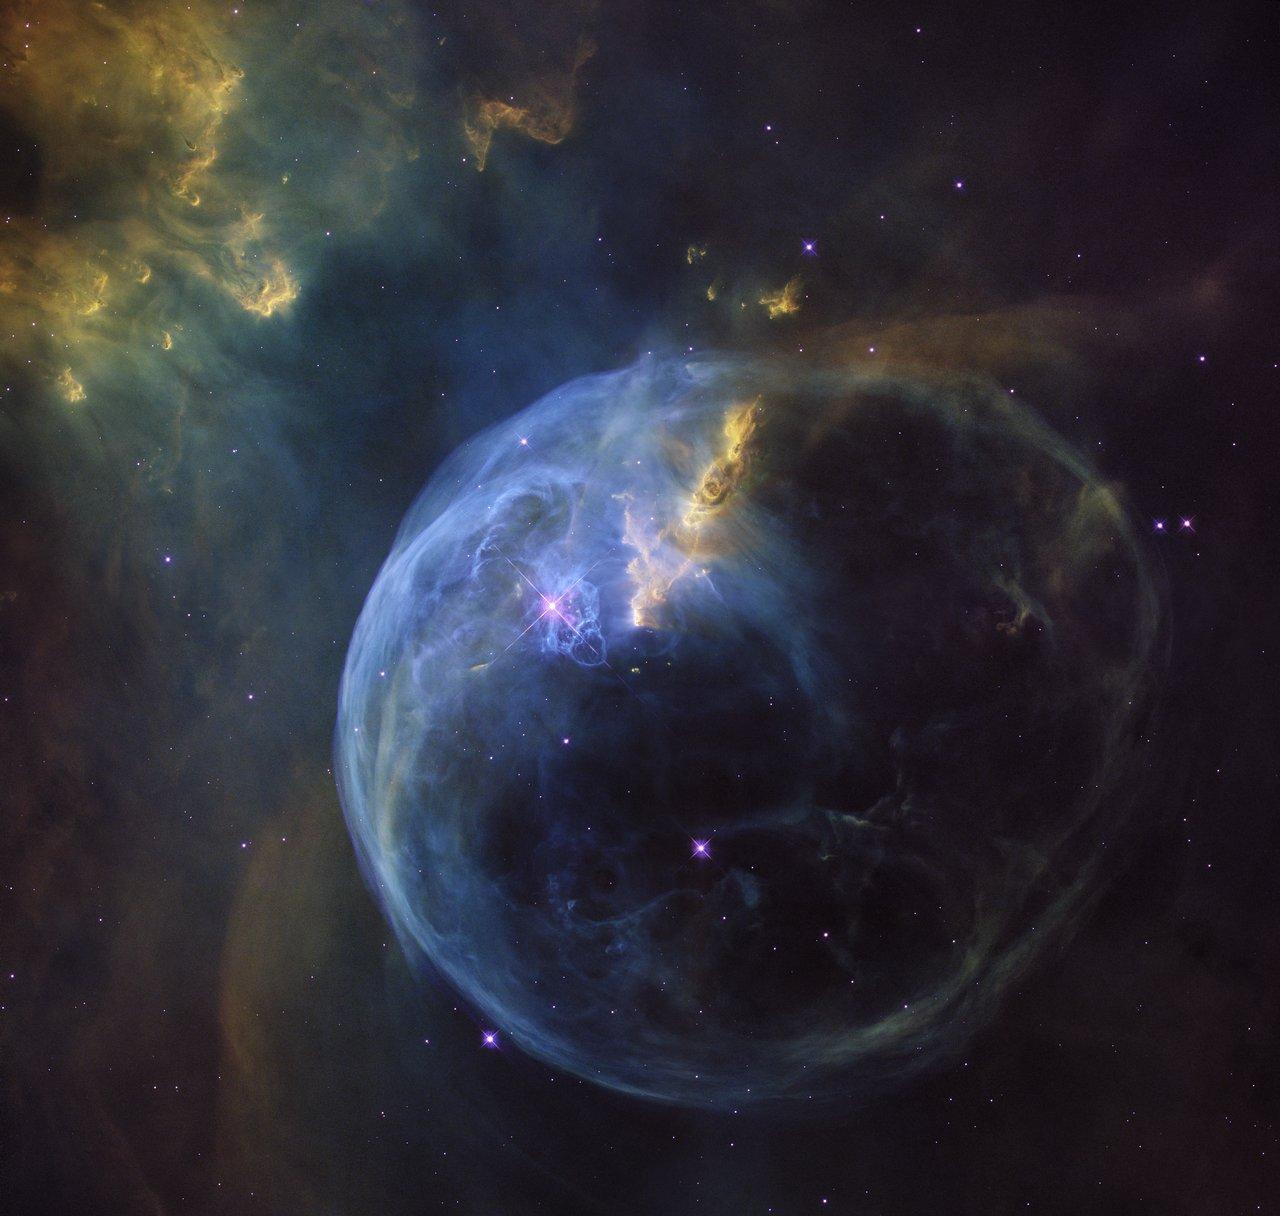 Bubble Nebula looks like giant cosmic soap bubble ...